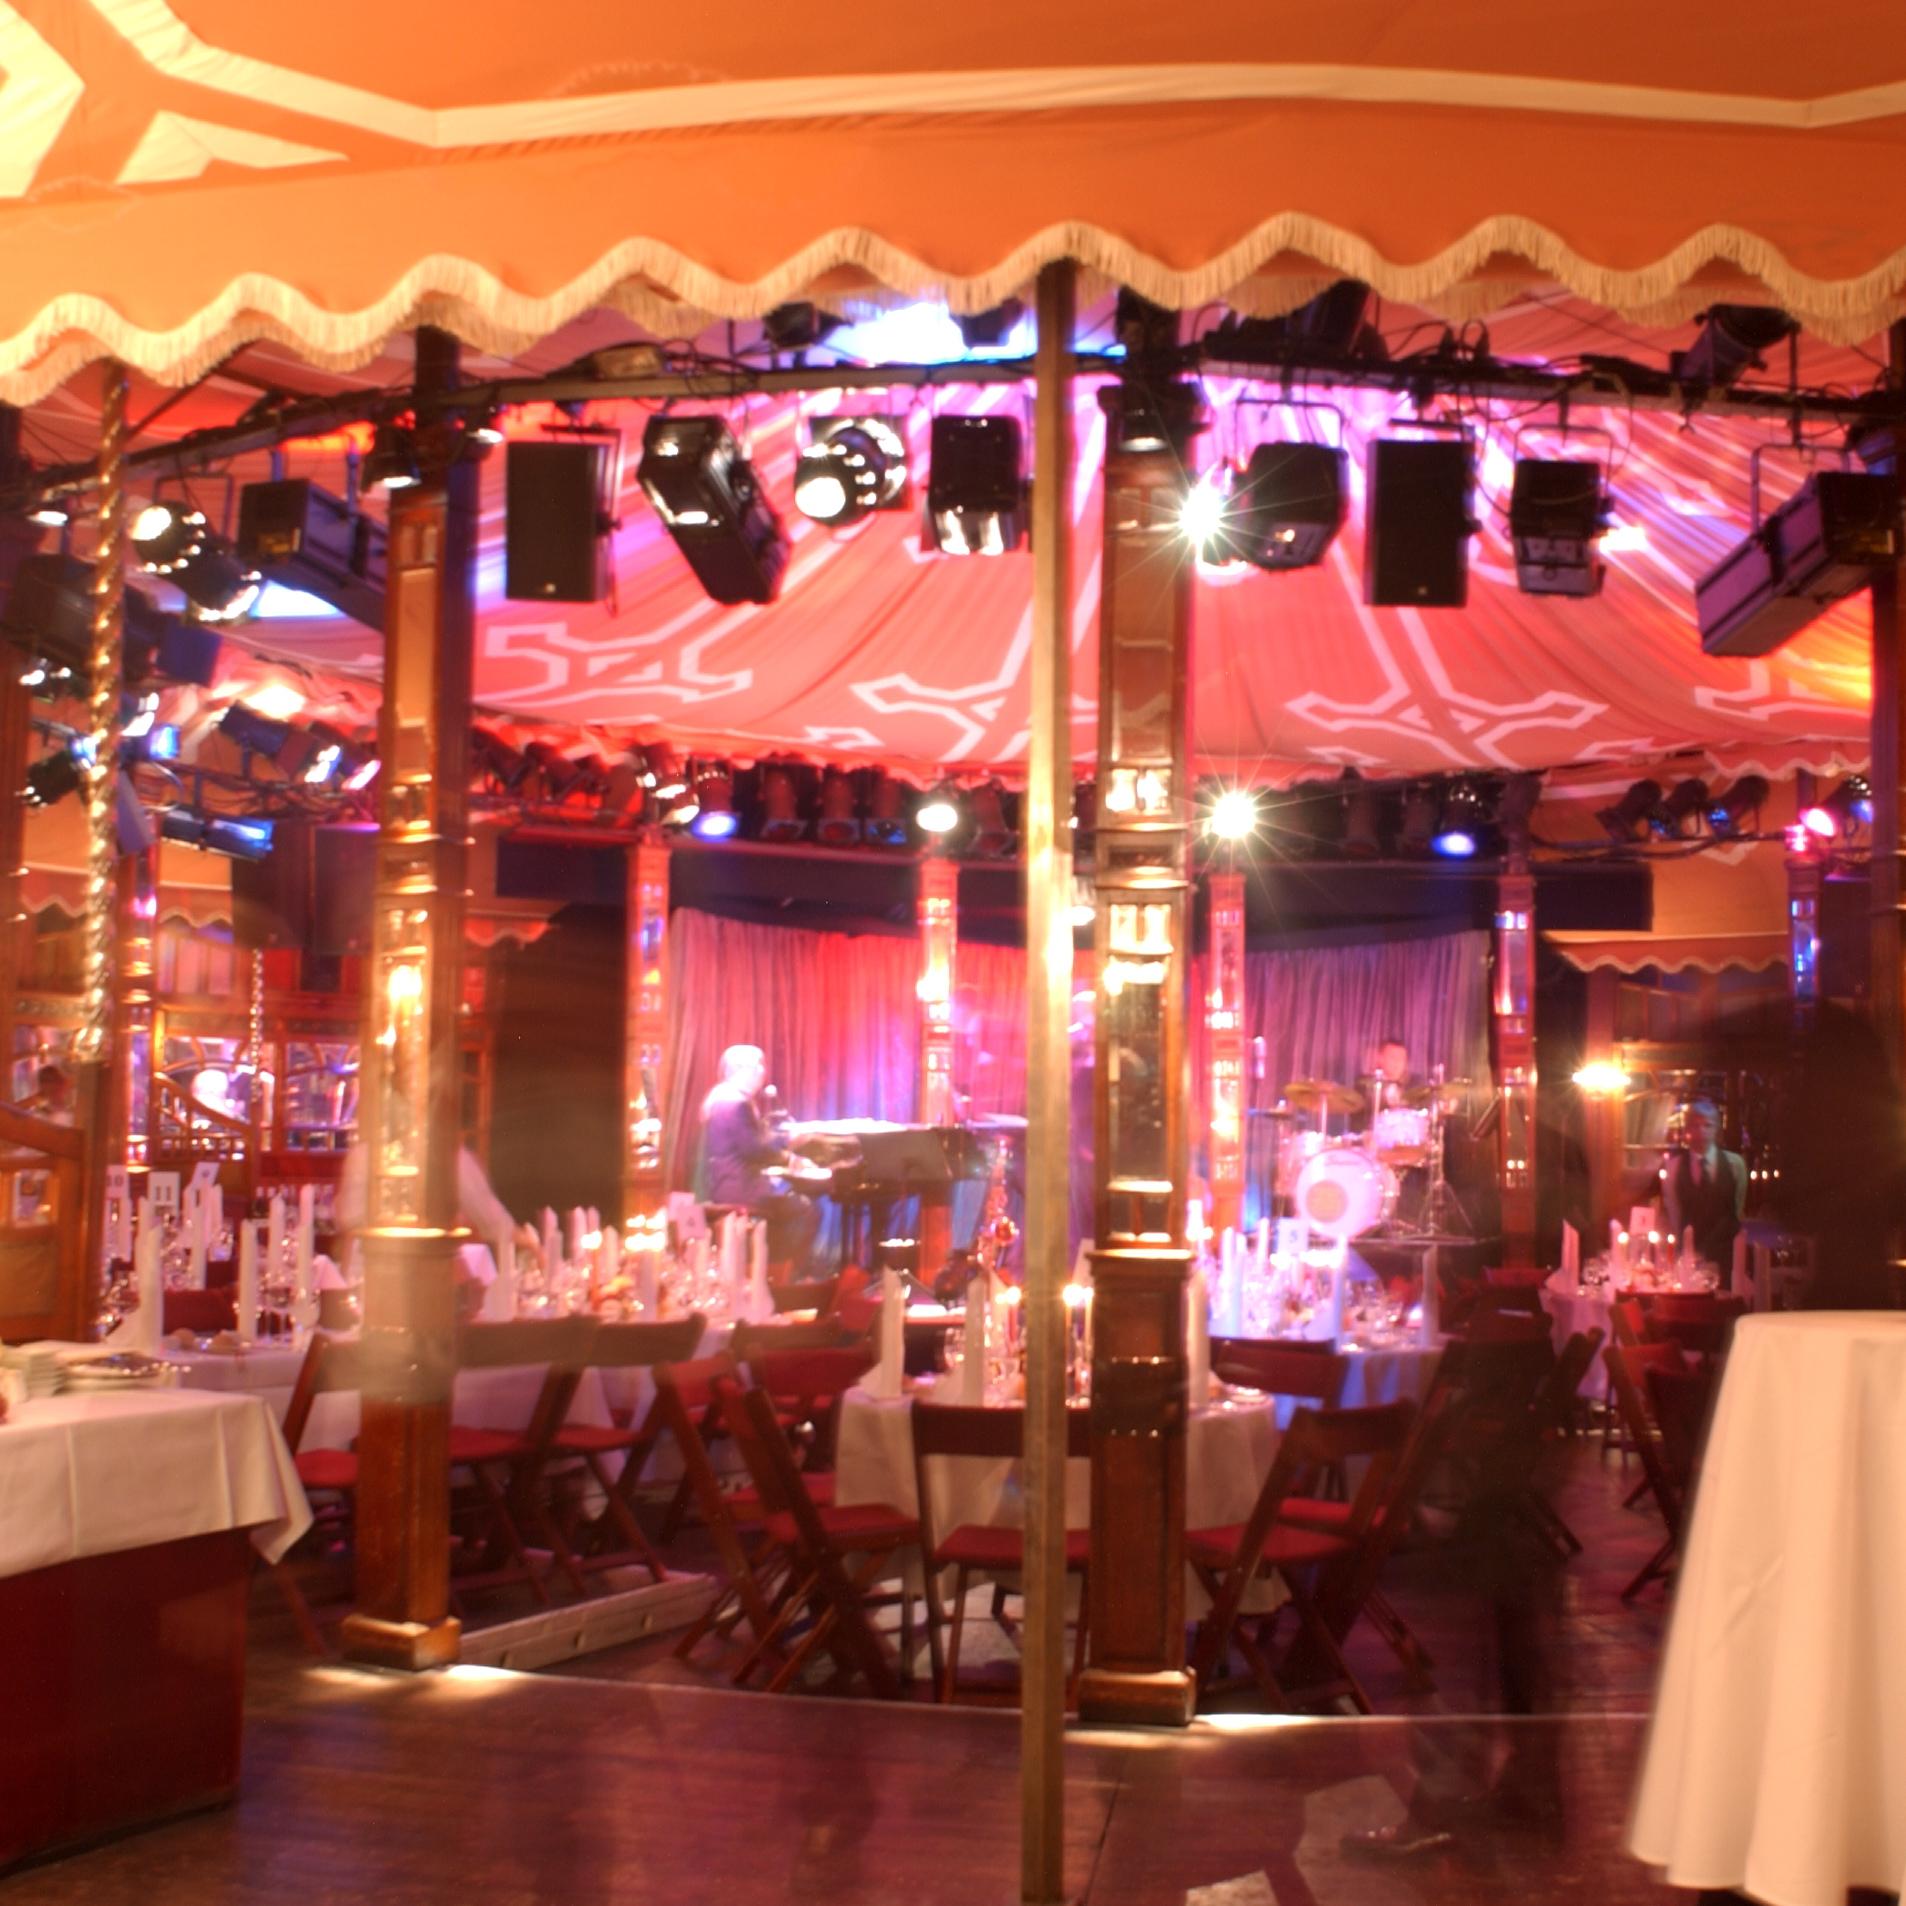 Bar-Jeder-Vernunft-Berlin-Chansons